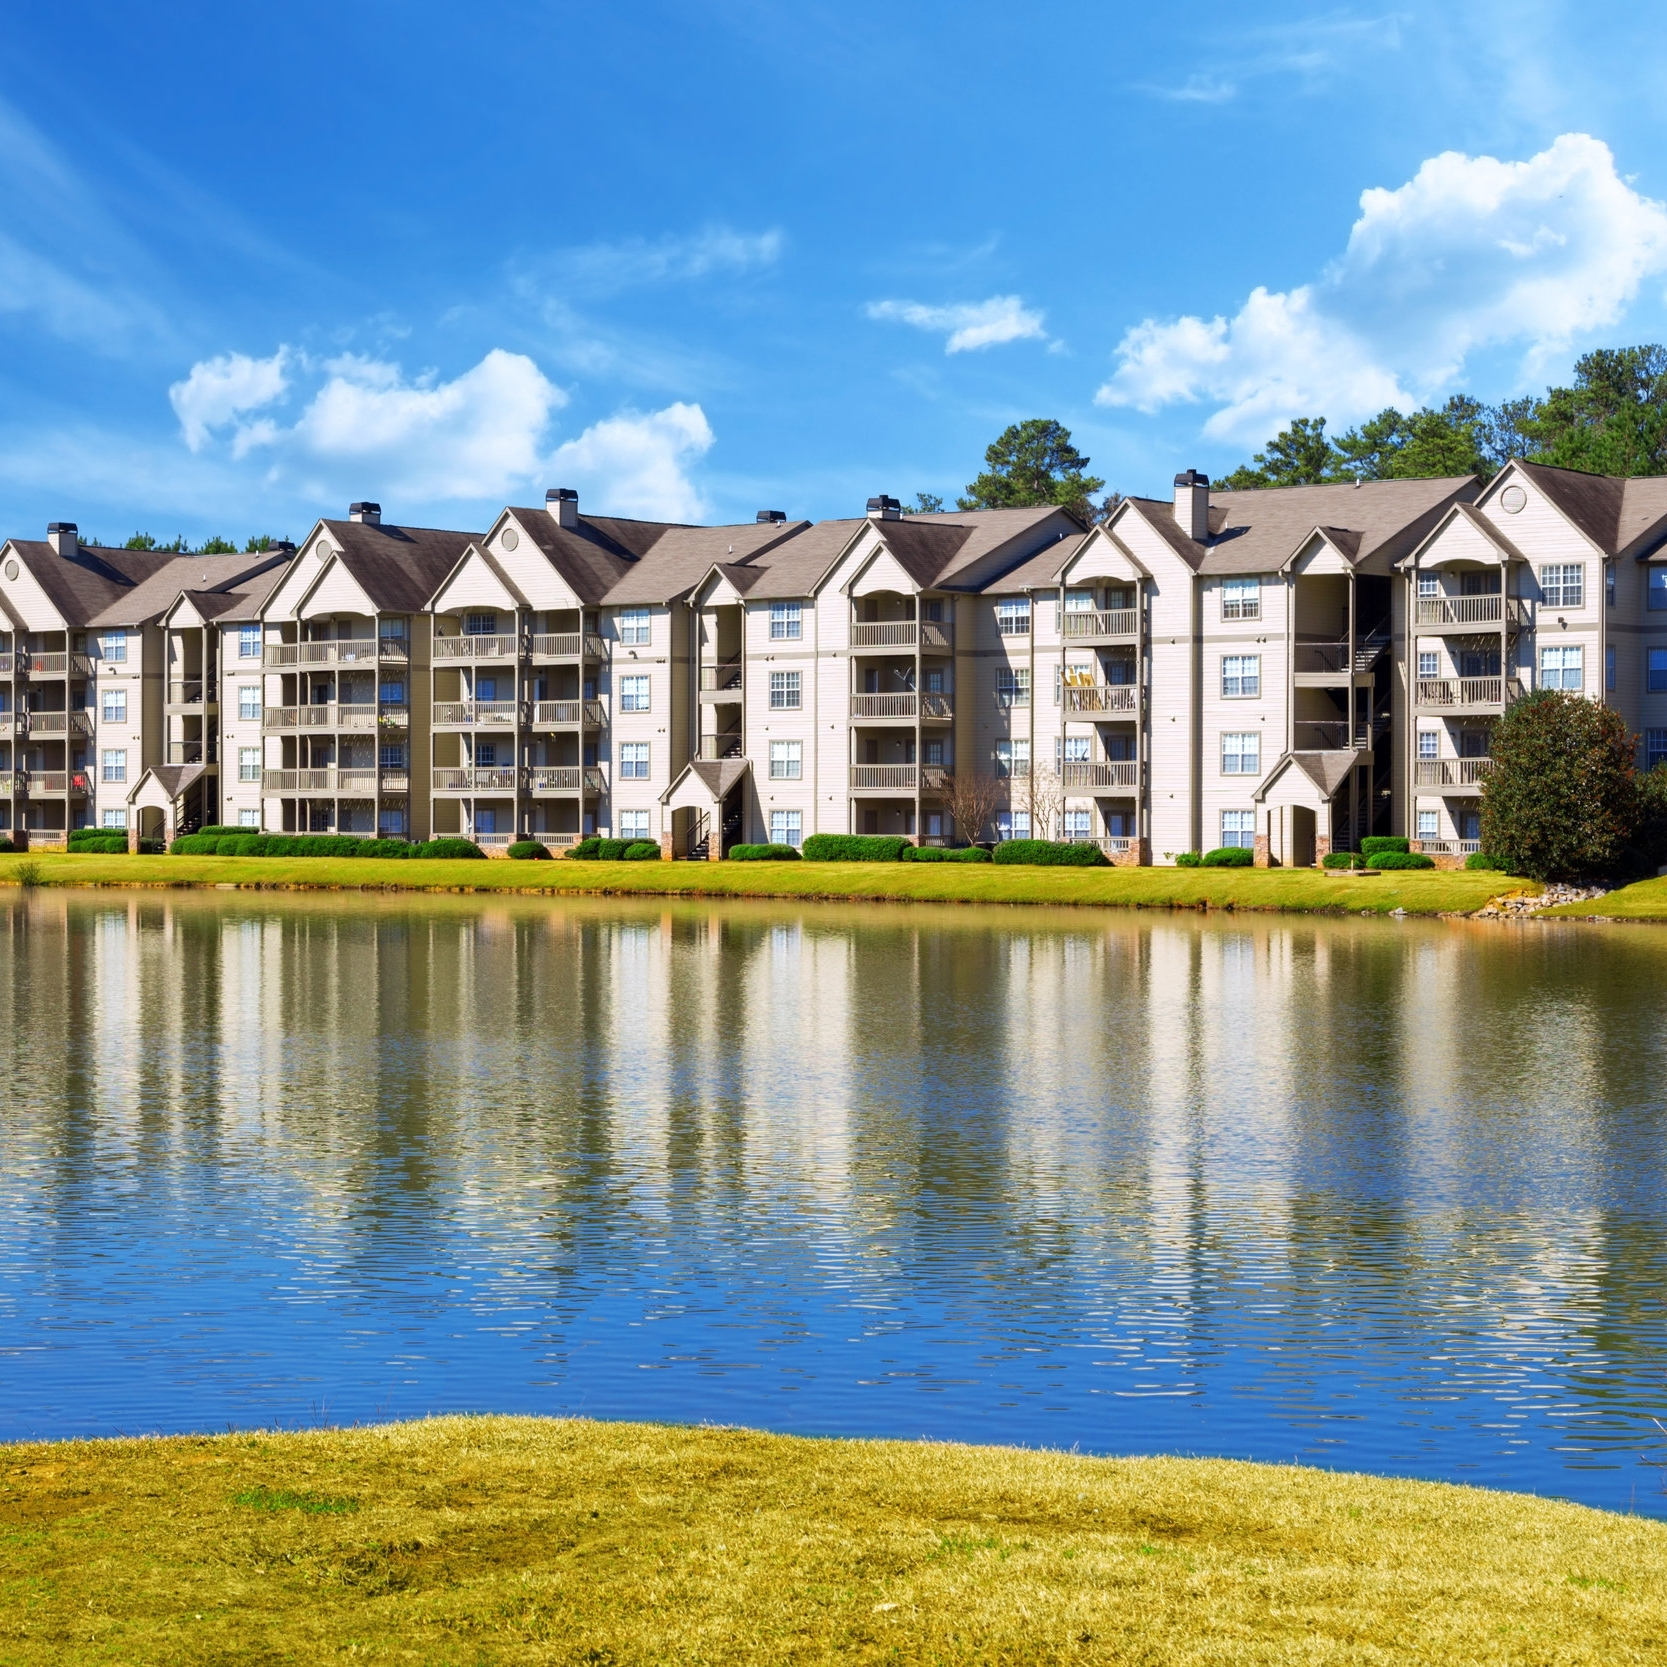 Wesley Pond Apartment Homes | Douglasville, GA | Built 1988 | Sold in 2016